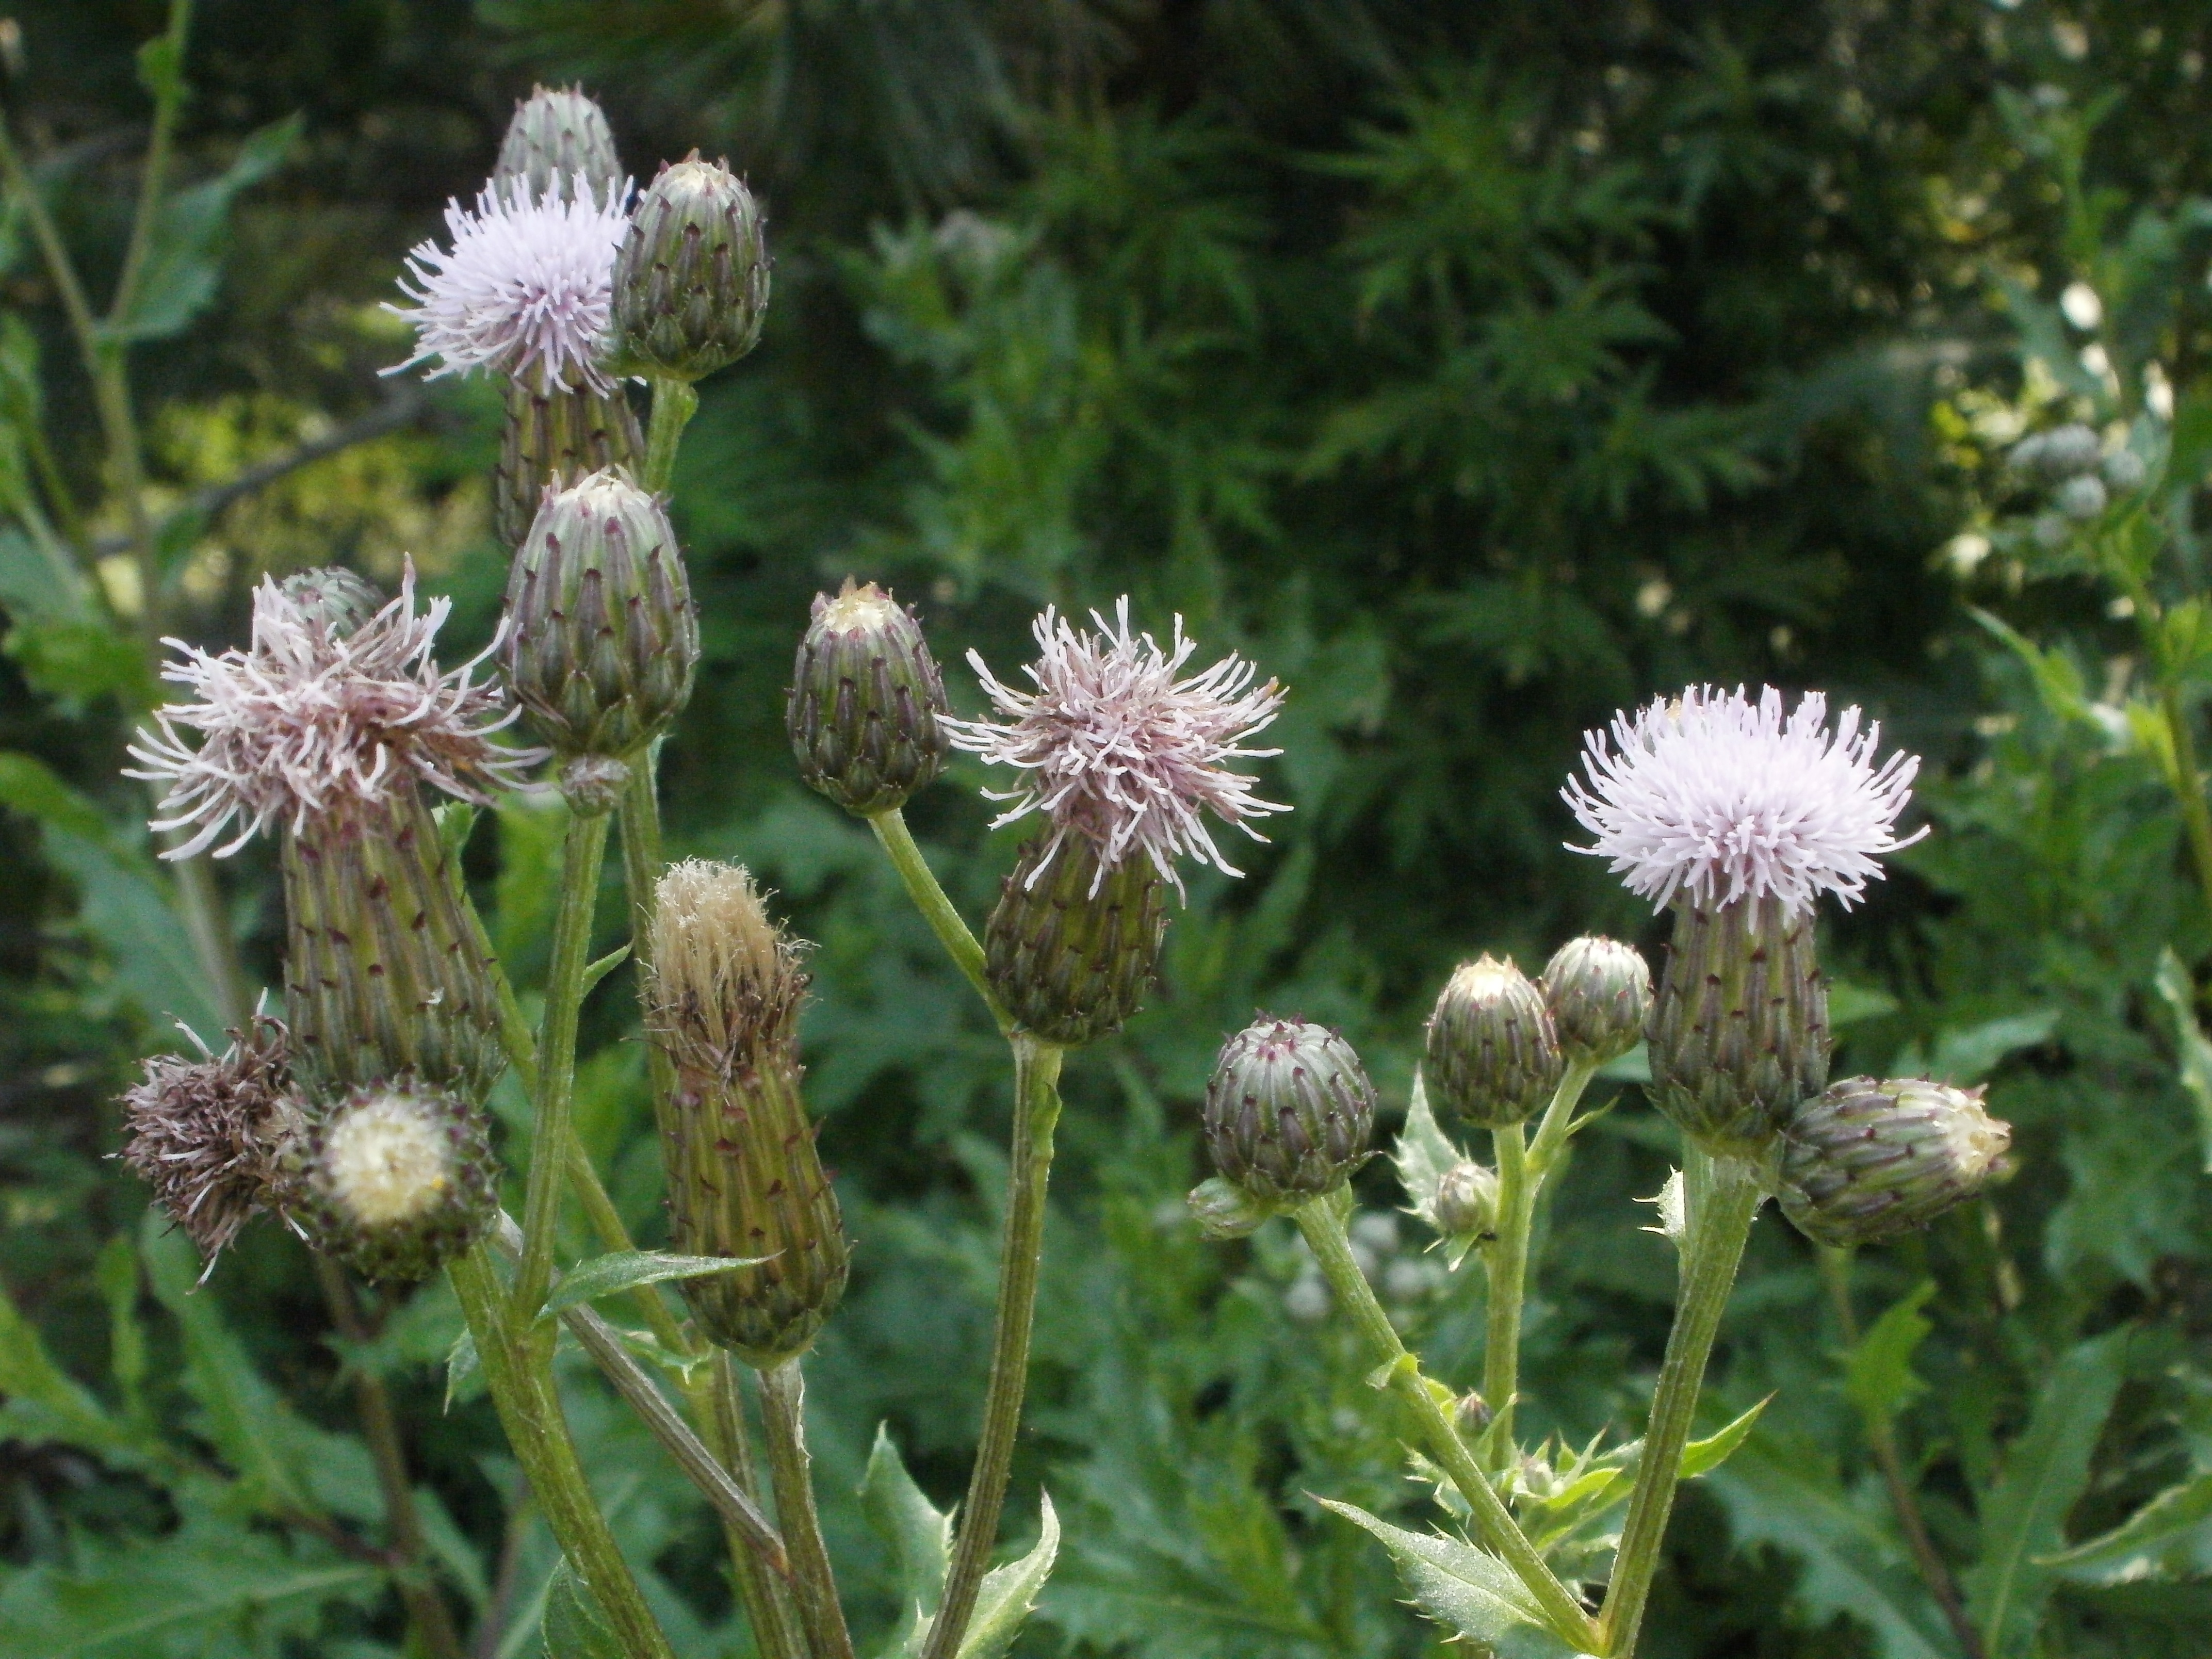 Canadian Thistle - Cirsium arvense   S&E Wards Landscape Management